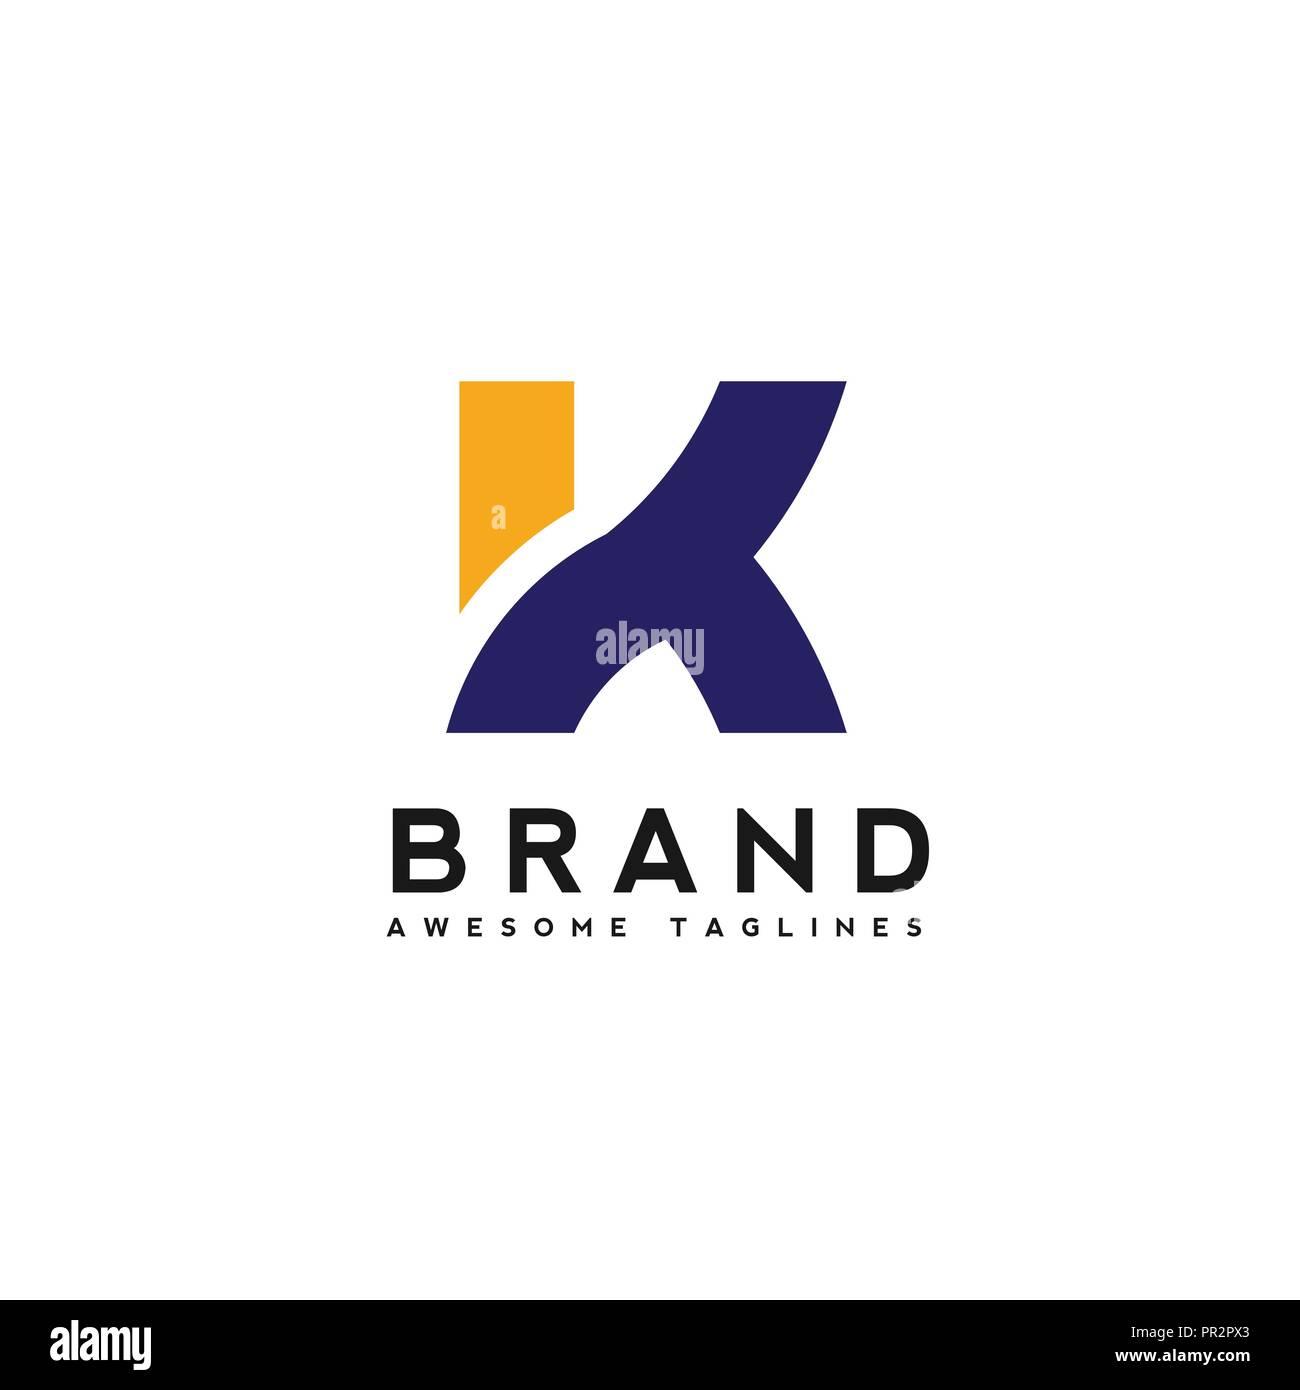 Letter K Logo Simple Design Template Business Corporate Creative Letter K Logo Design Best New Letter K Logo Stock Vector Image Art Alamy,Minimalist Kitchen Design Black